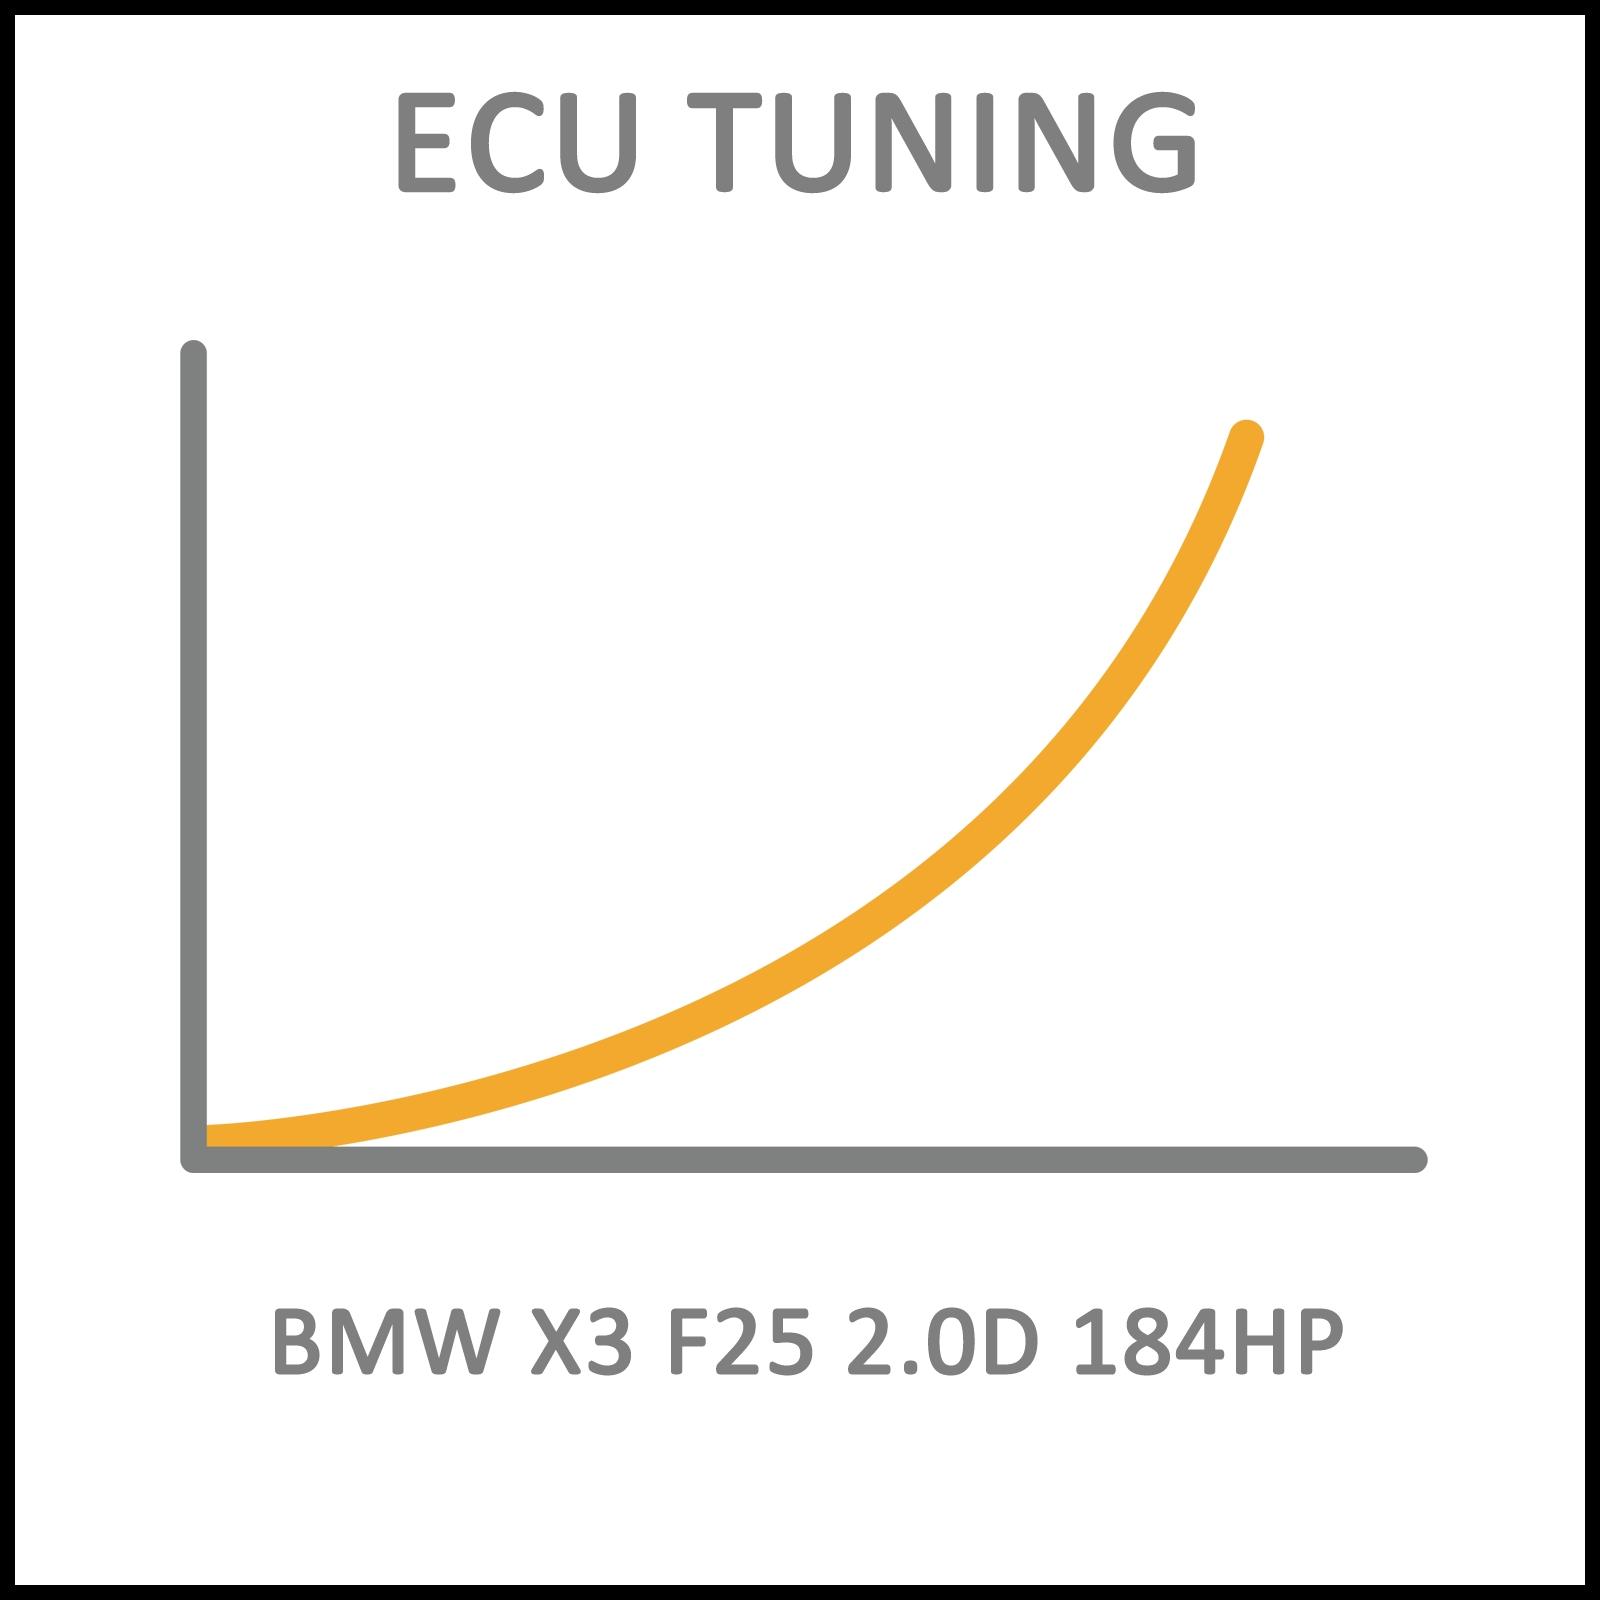 BMW X3 F25 2 0D 184HP ECU Tuning Remapping Programming